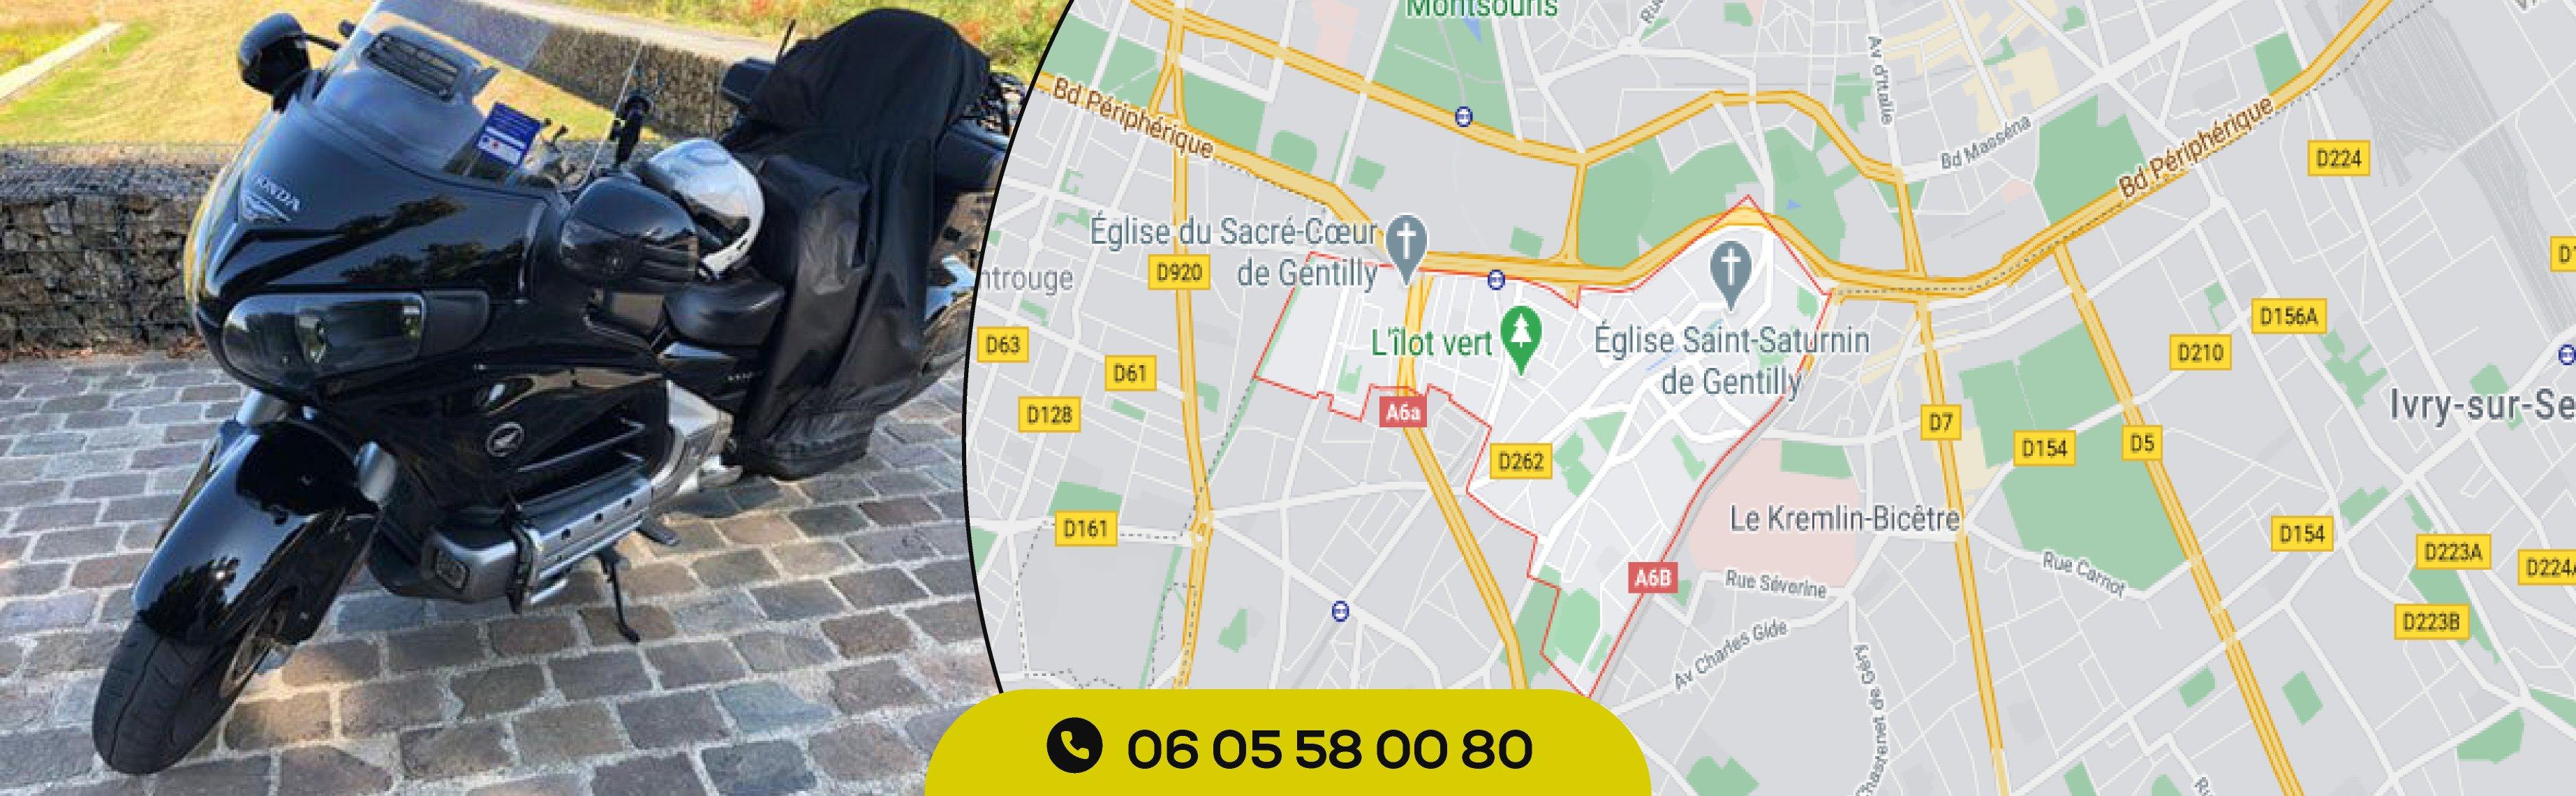 Taxi-moto-gentilly